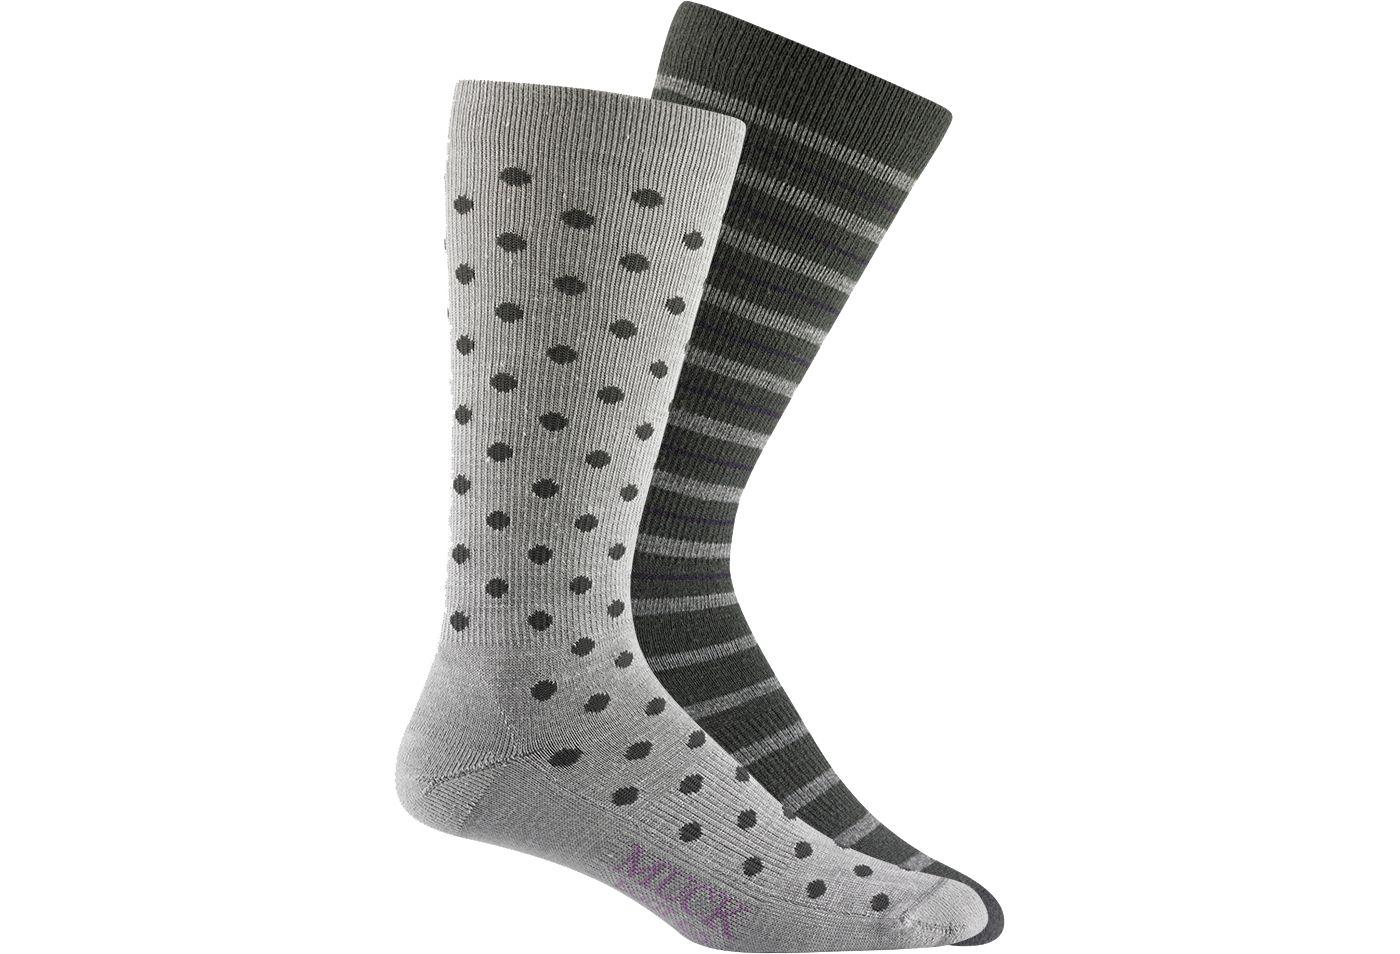 Muck's Women's Serena Crew Socks 2 Pack